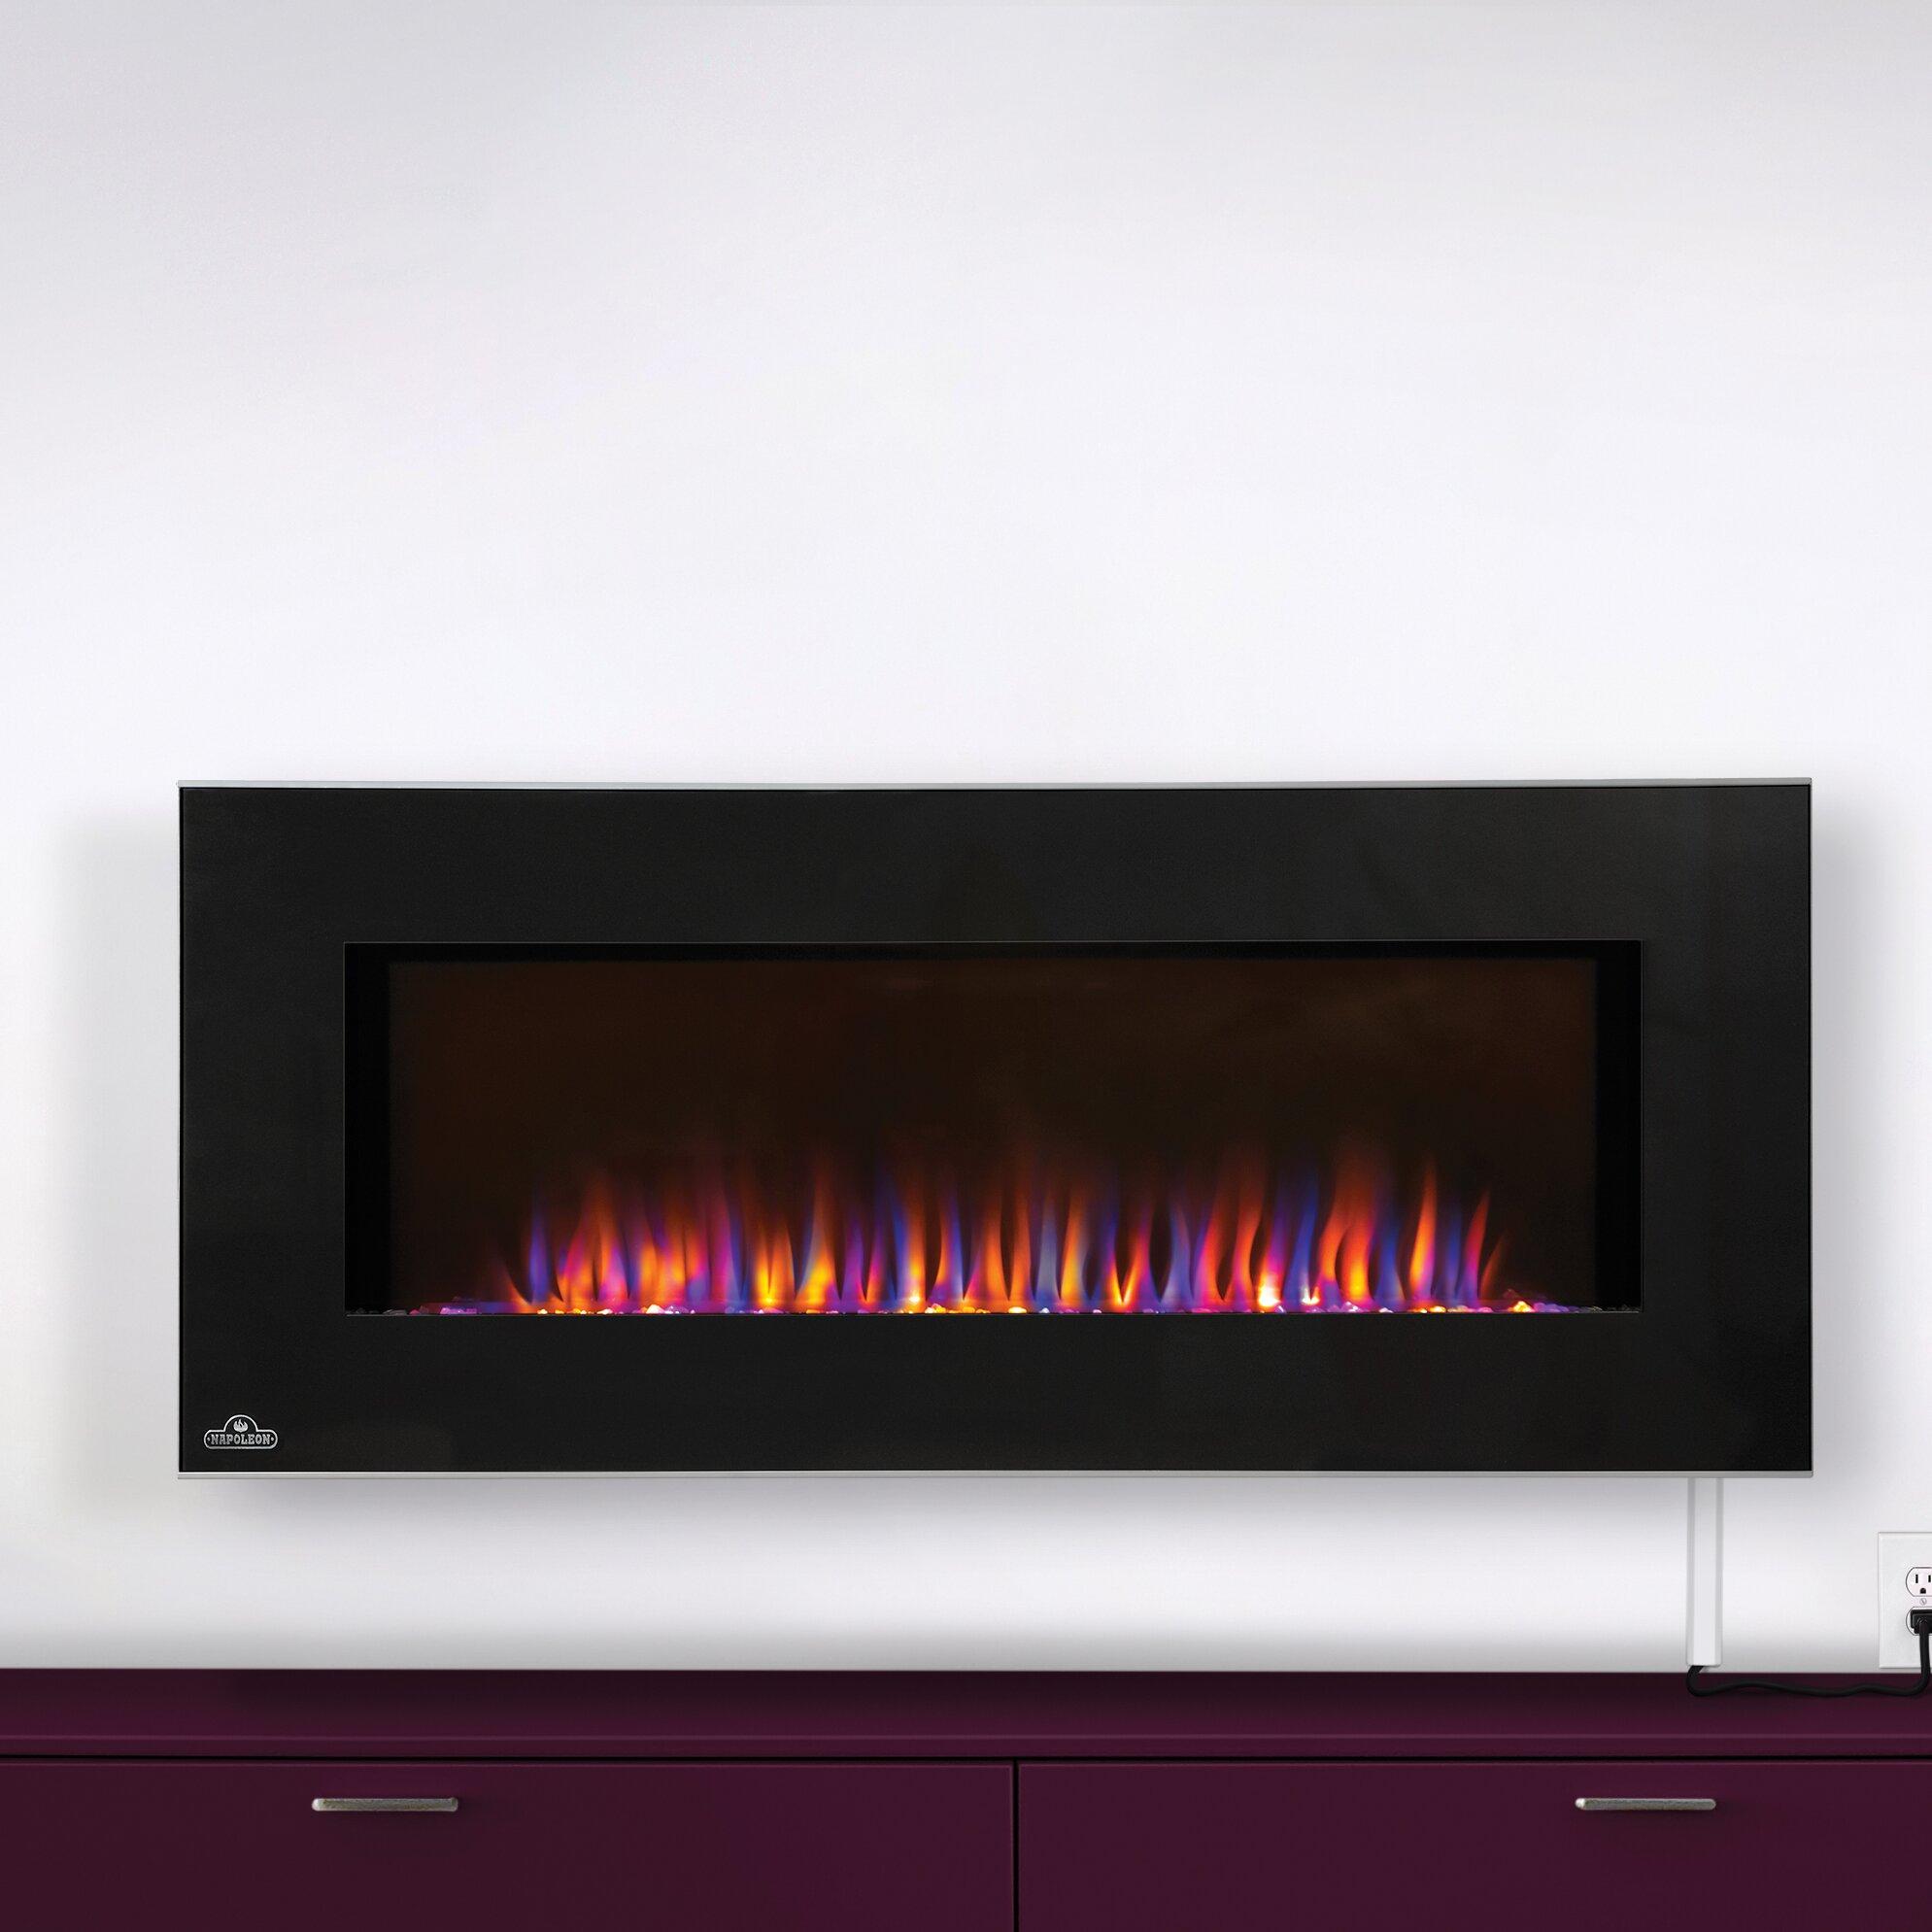 napoleon azure wall mount electric fireplace wayfair. Black Bedroom Furniture Sets. Home Design Ideas